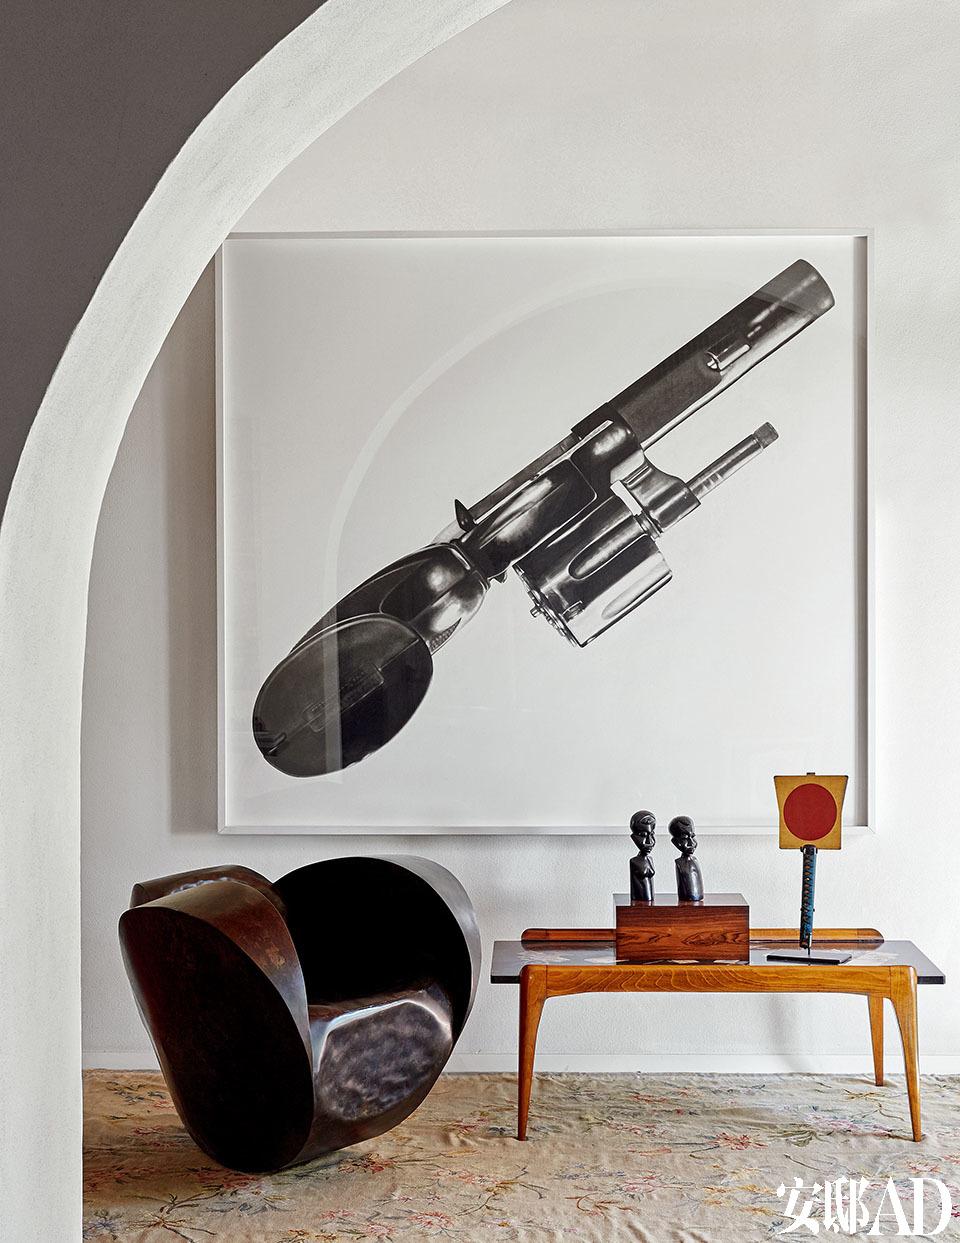 "Robert Longo于2005年的画作Untitled (357 Reload)。Pietro Chiesa为Fontana Arte设计的20世纪40年代茶几。茶几上摆着17世纪日本军队的传统方形铁扇,Ron Arad 1989年设计的扶手椅""Rolling Volume""。"